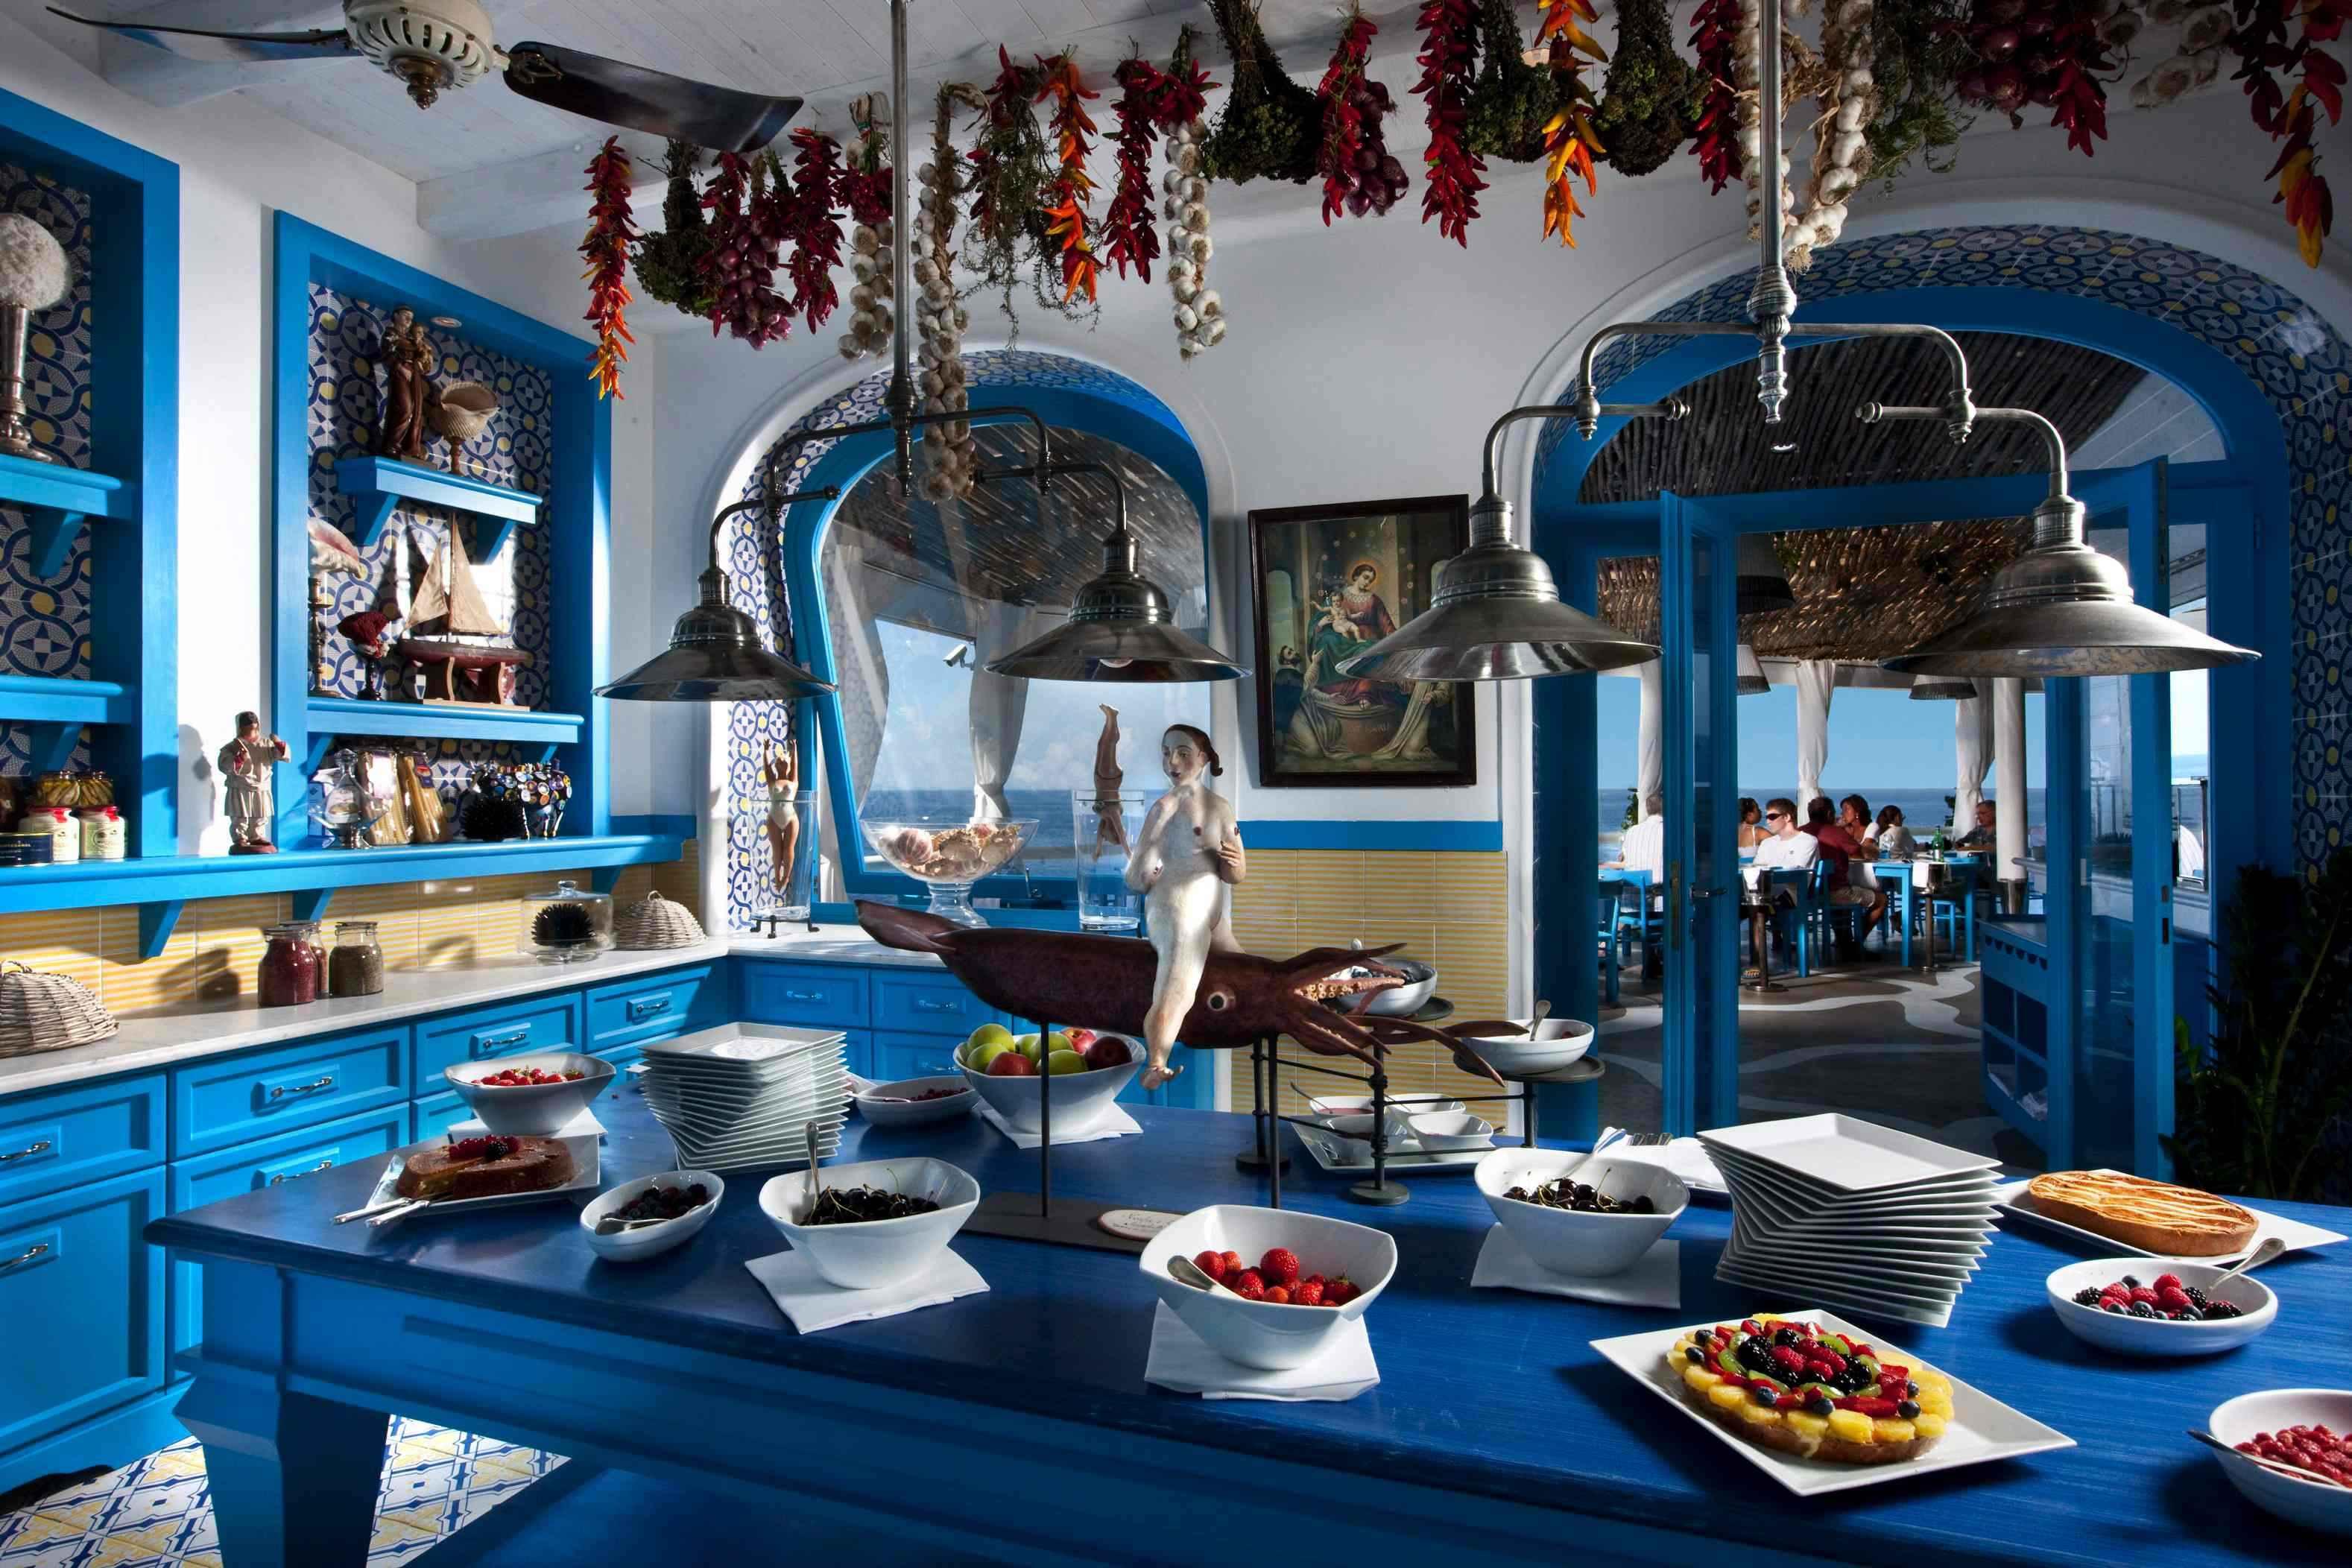 Mediterranean Restaurants Design : The 10 best things to do on the island of Capri - Jan Fuscoe - Writer ...